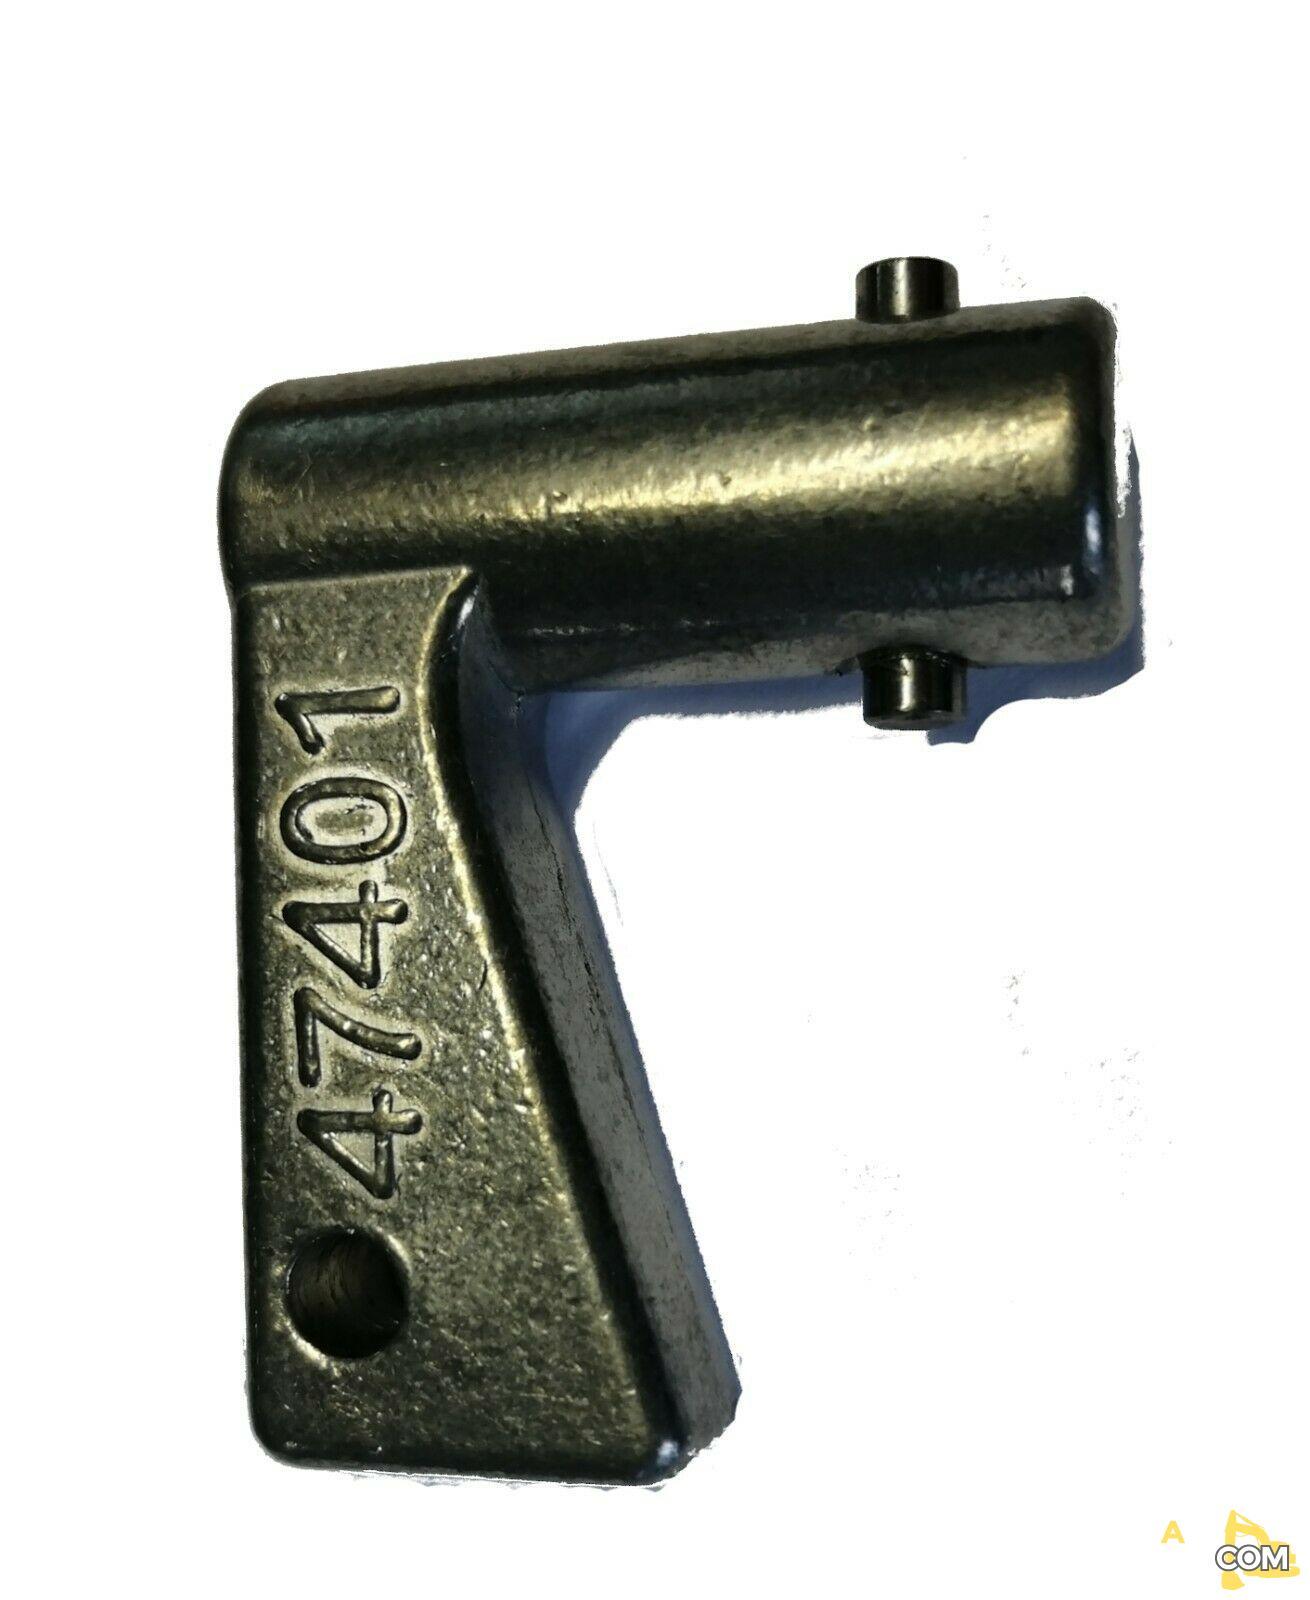 JCB Terex Metal Isolator Key 47401 for JCB Terex 14mm Diameter 4mm Pin